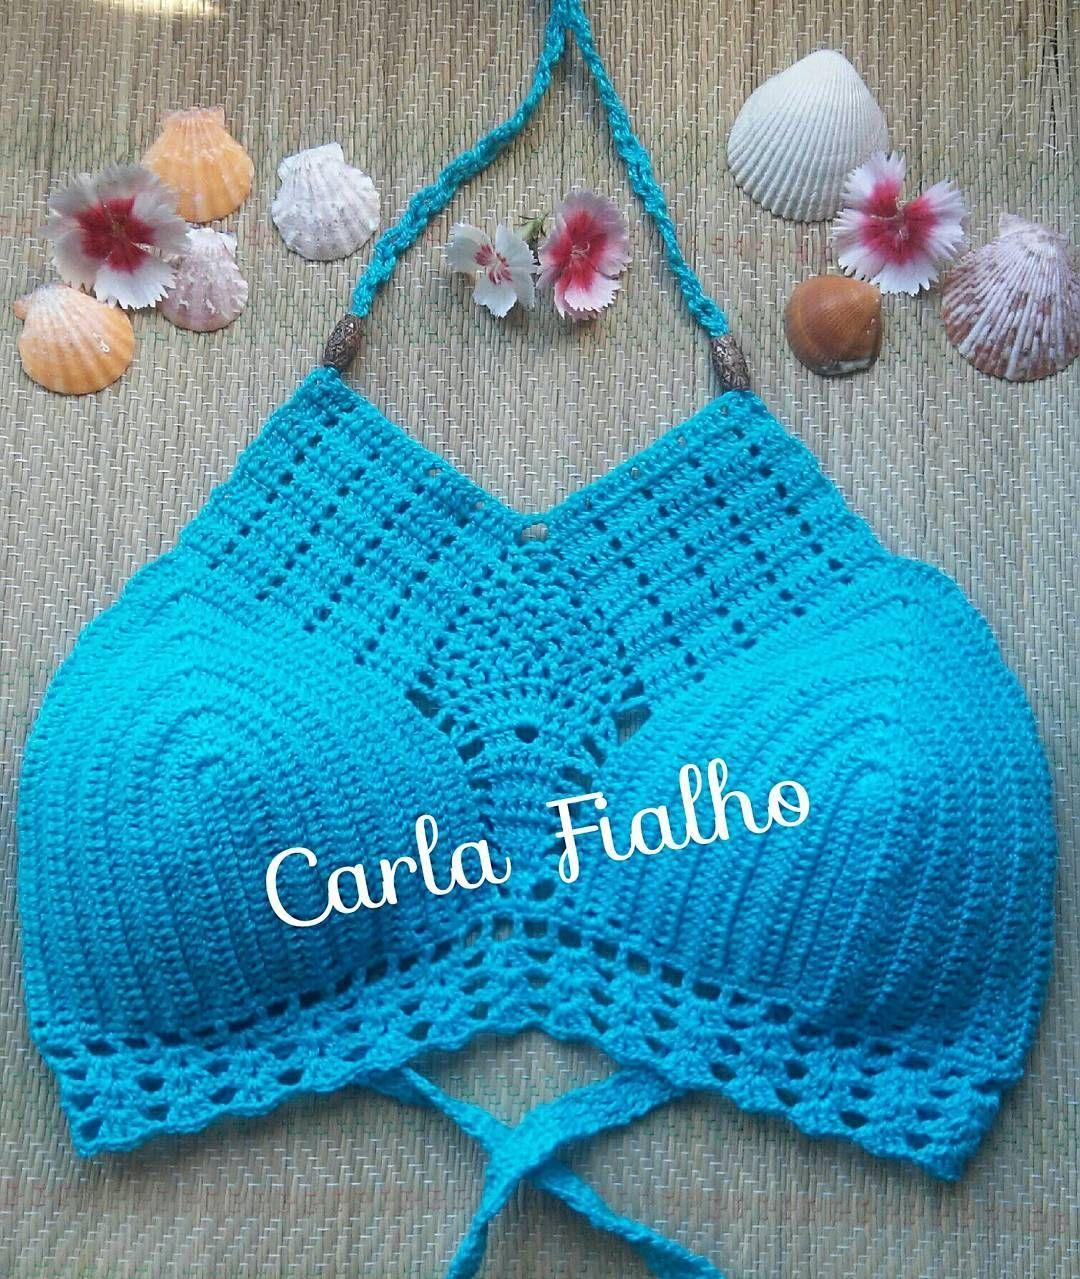 Cor linda top biquíni ☀ #lover #crochet #bikini #verão #modafeminina #modaparameninas #handmade #praias #styles #crochetbraids #azul #tøp #instagramq8 #crocheting #beach #sole #girlsbestfriend